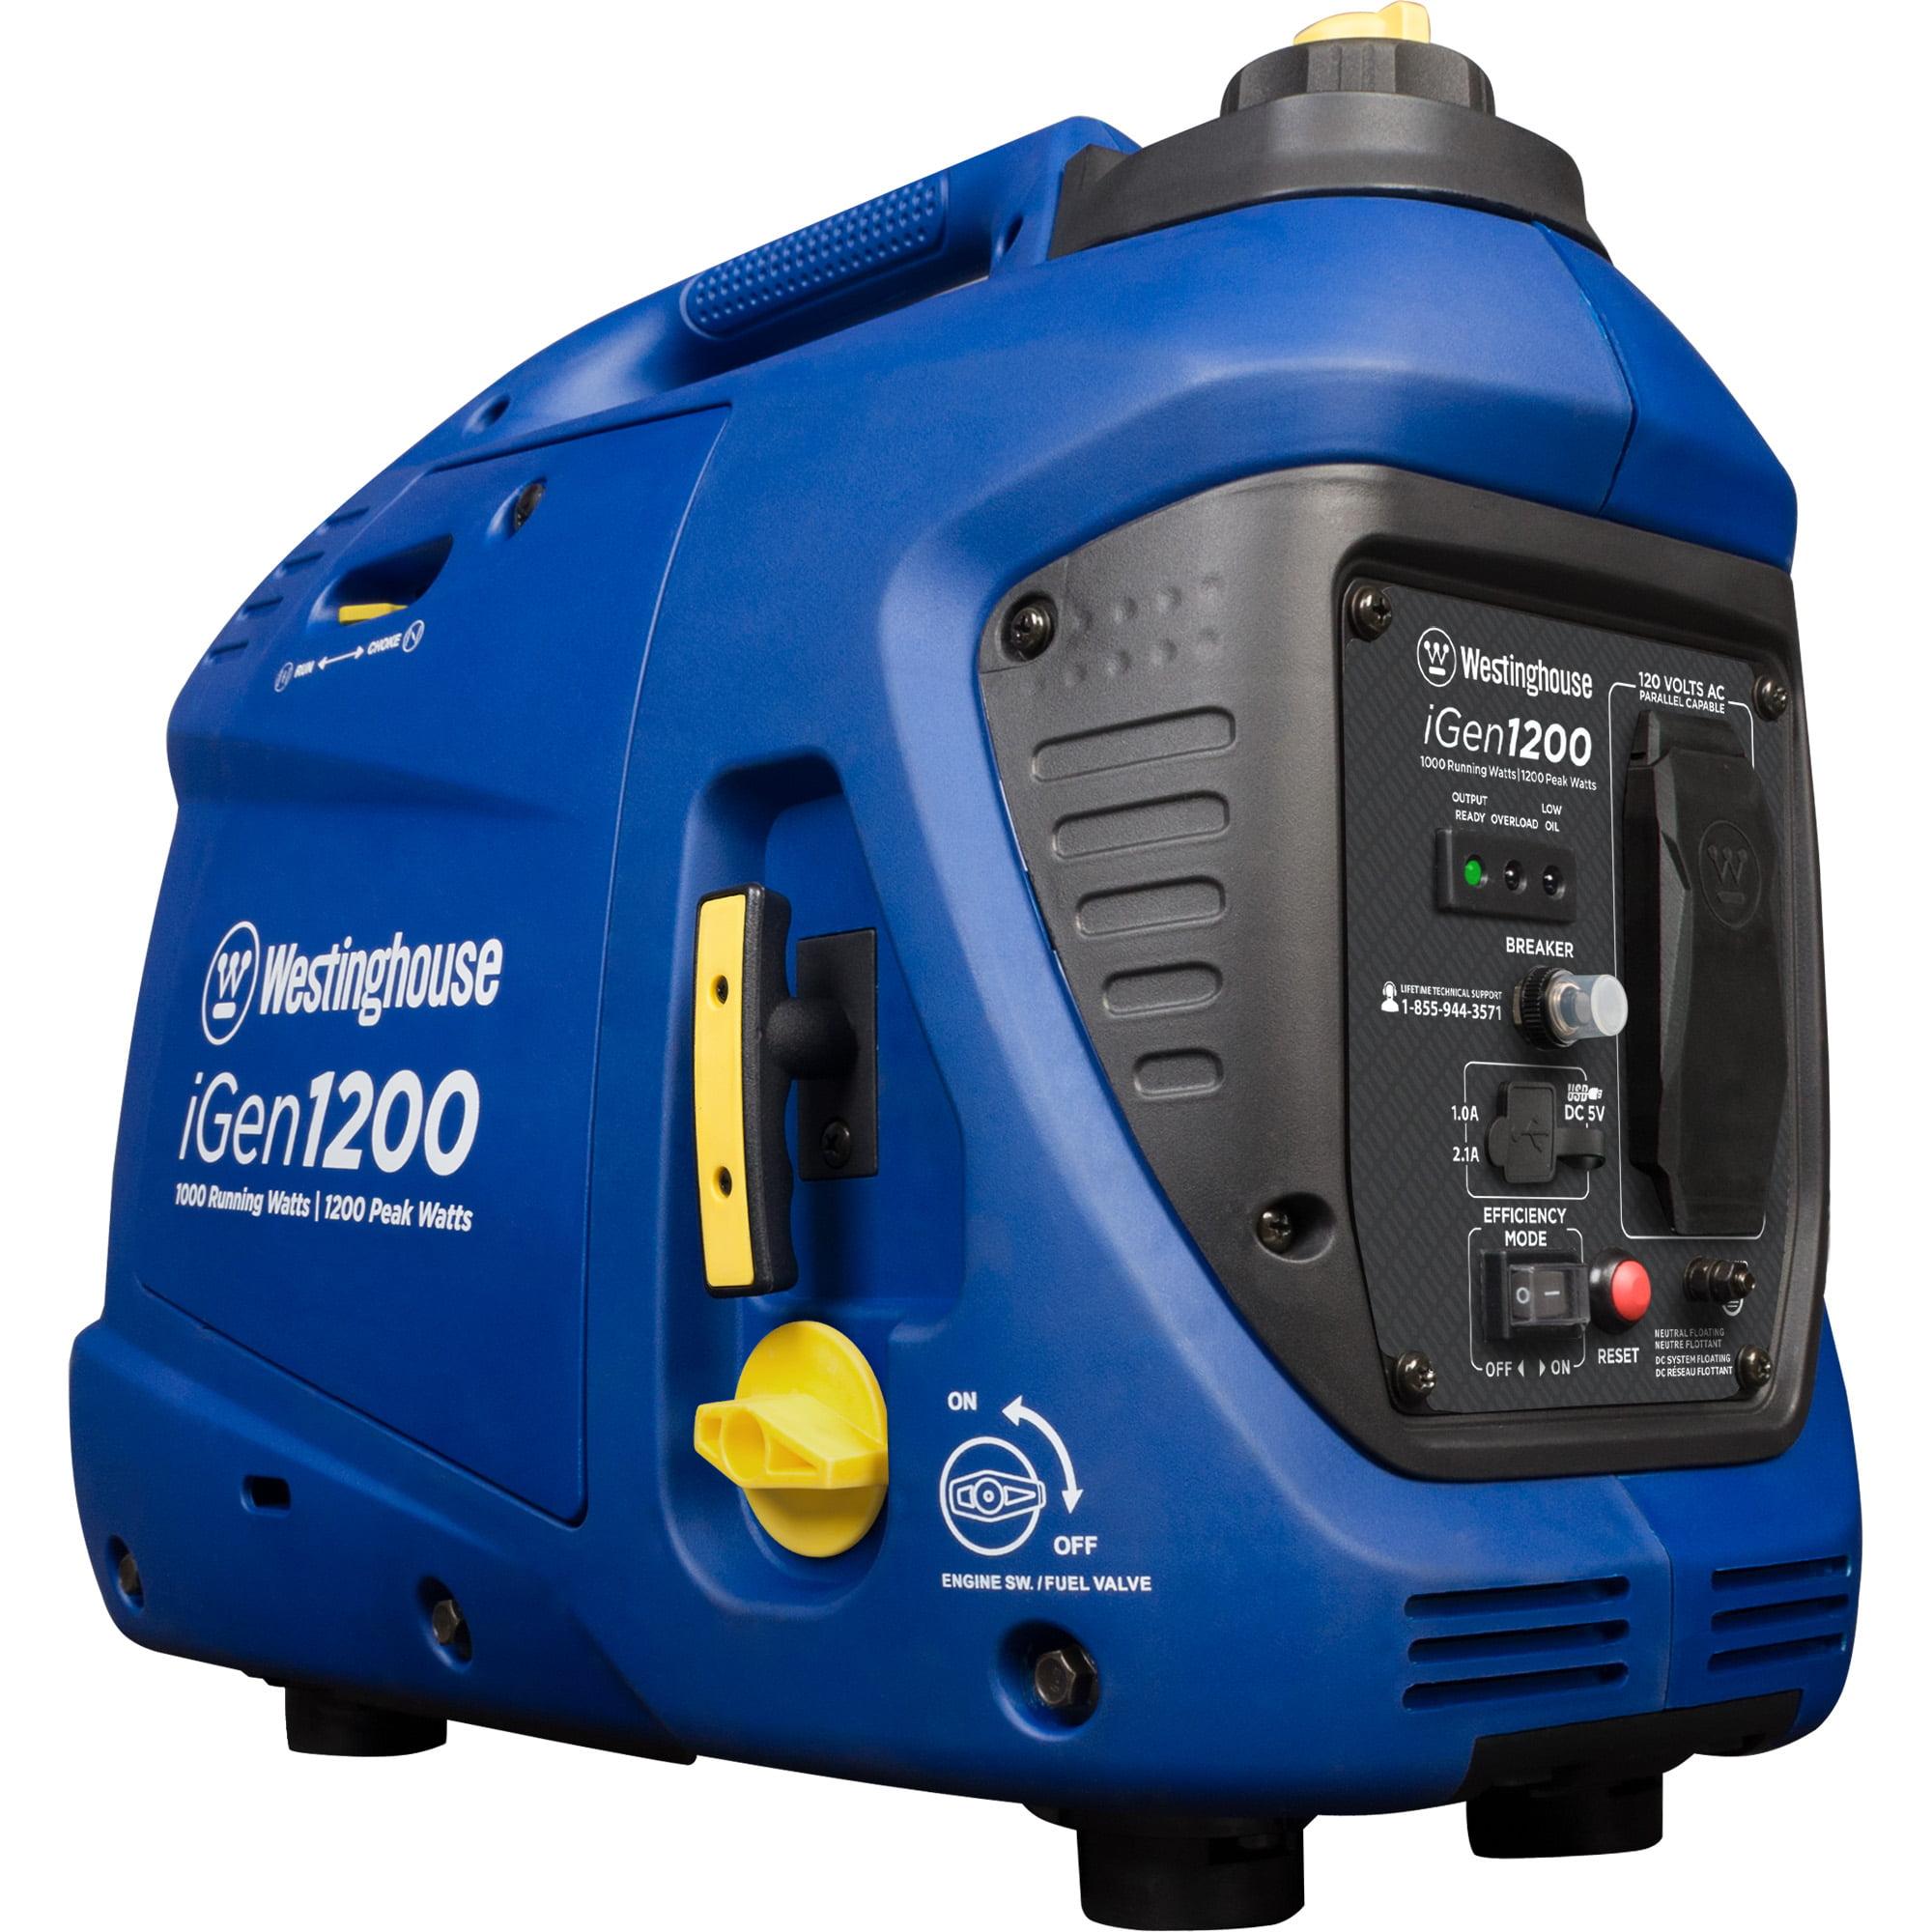 westinghouse igen1200 gas powered portable inverter generator rh walmart com